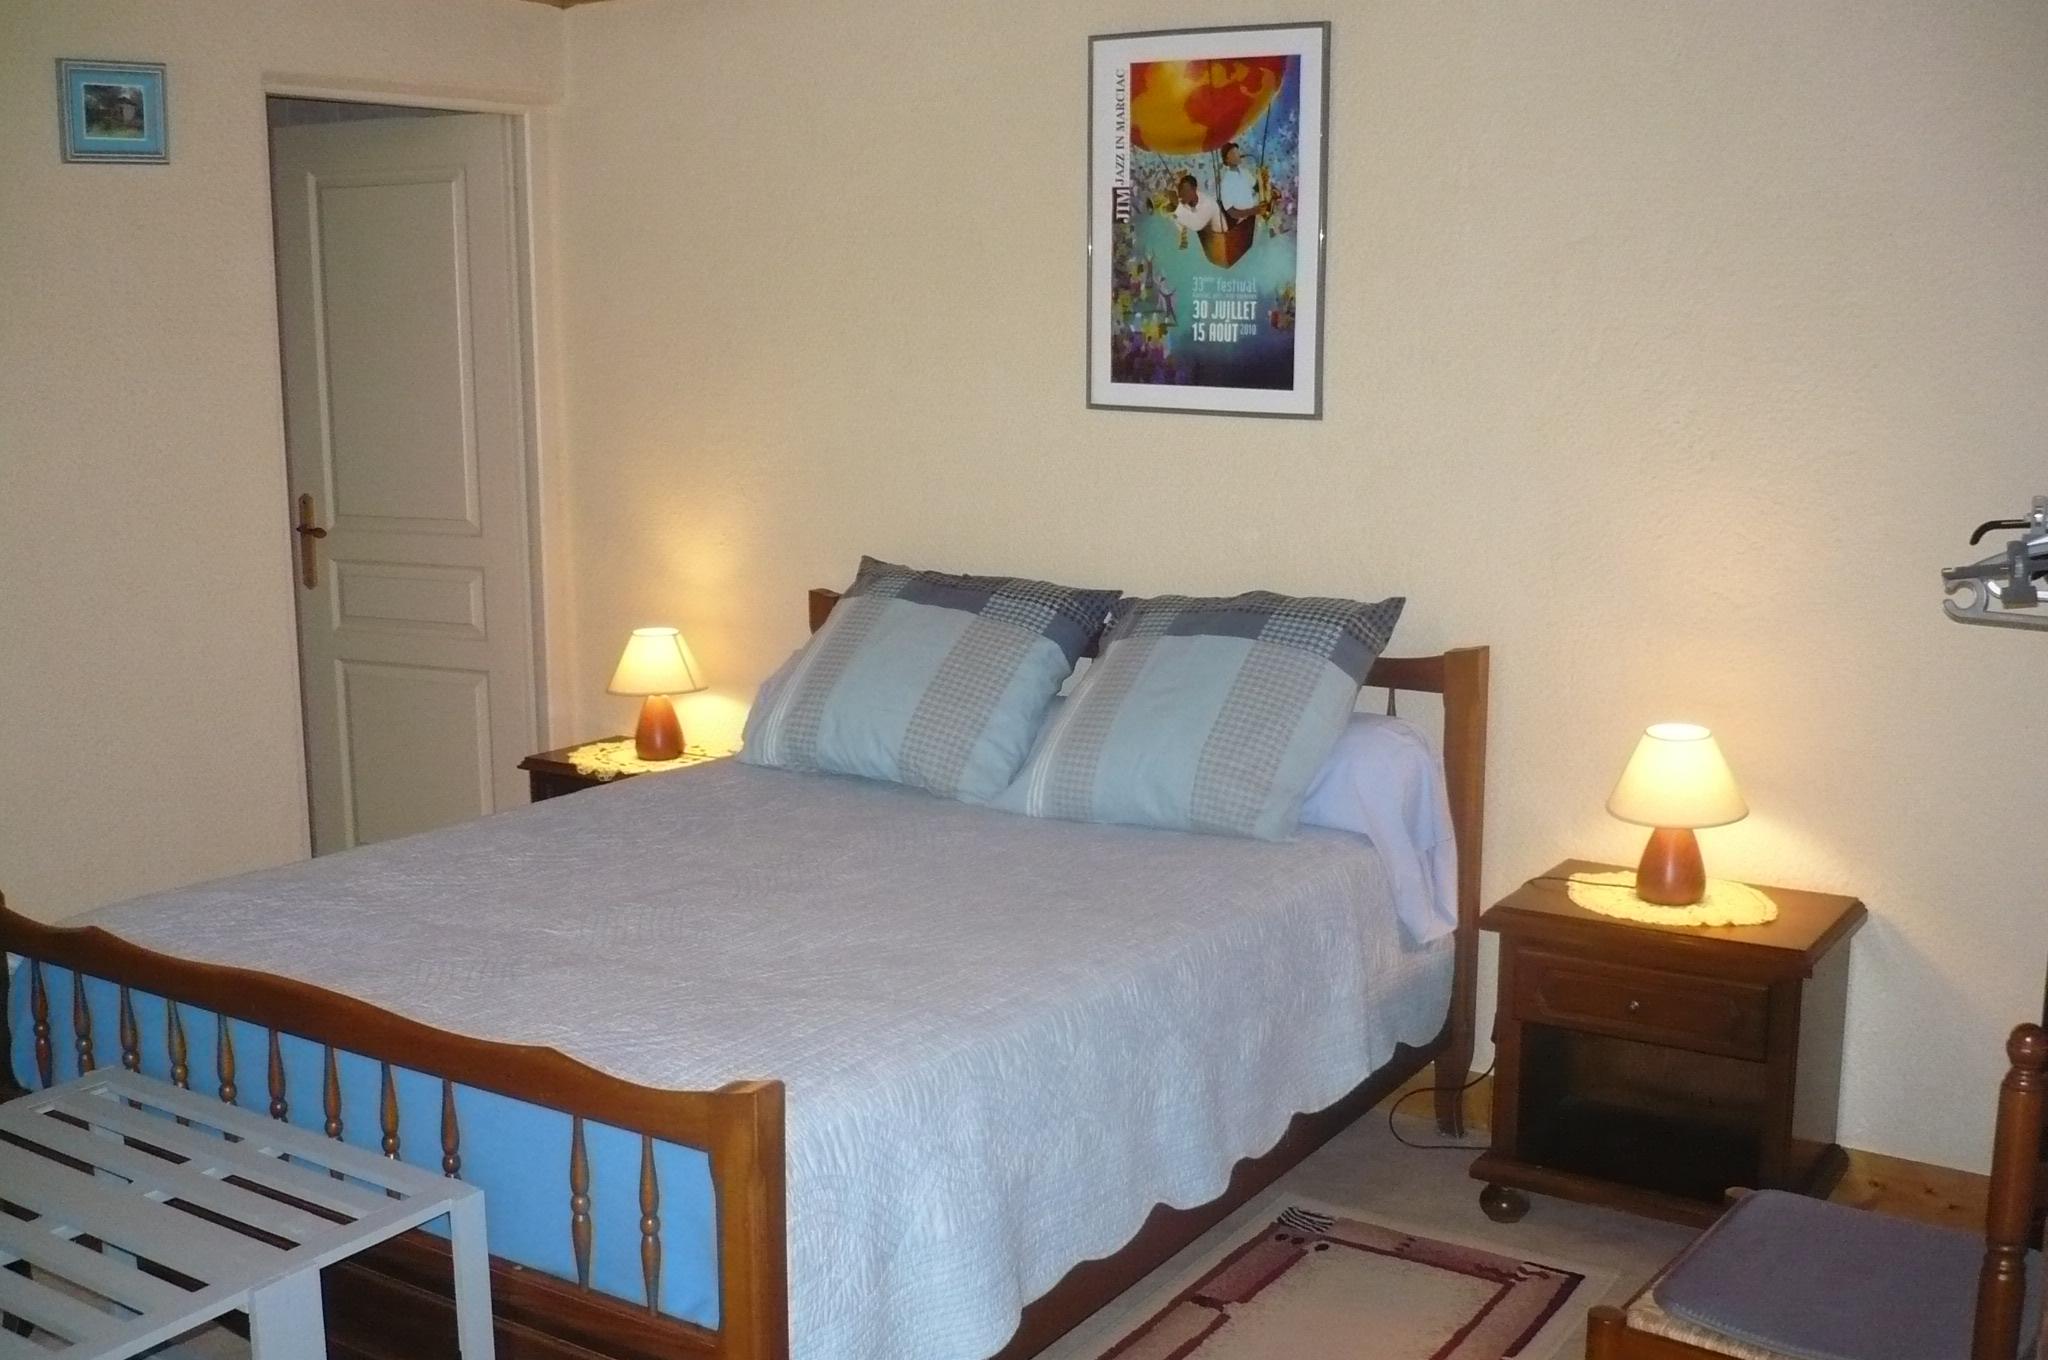 chambres d 39 h tes camping la ferme montestruc dans gers. Black Bedroom Furniture Sets. Home Design Ideas